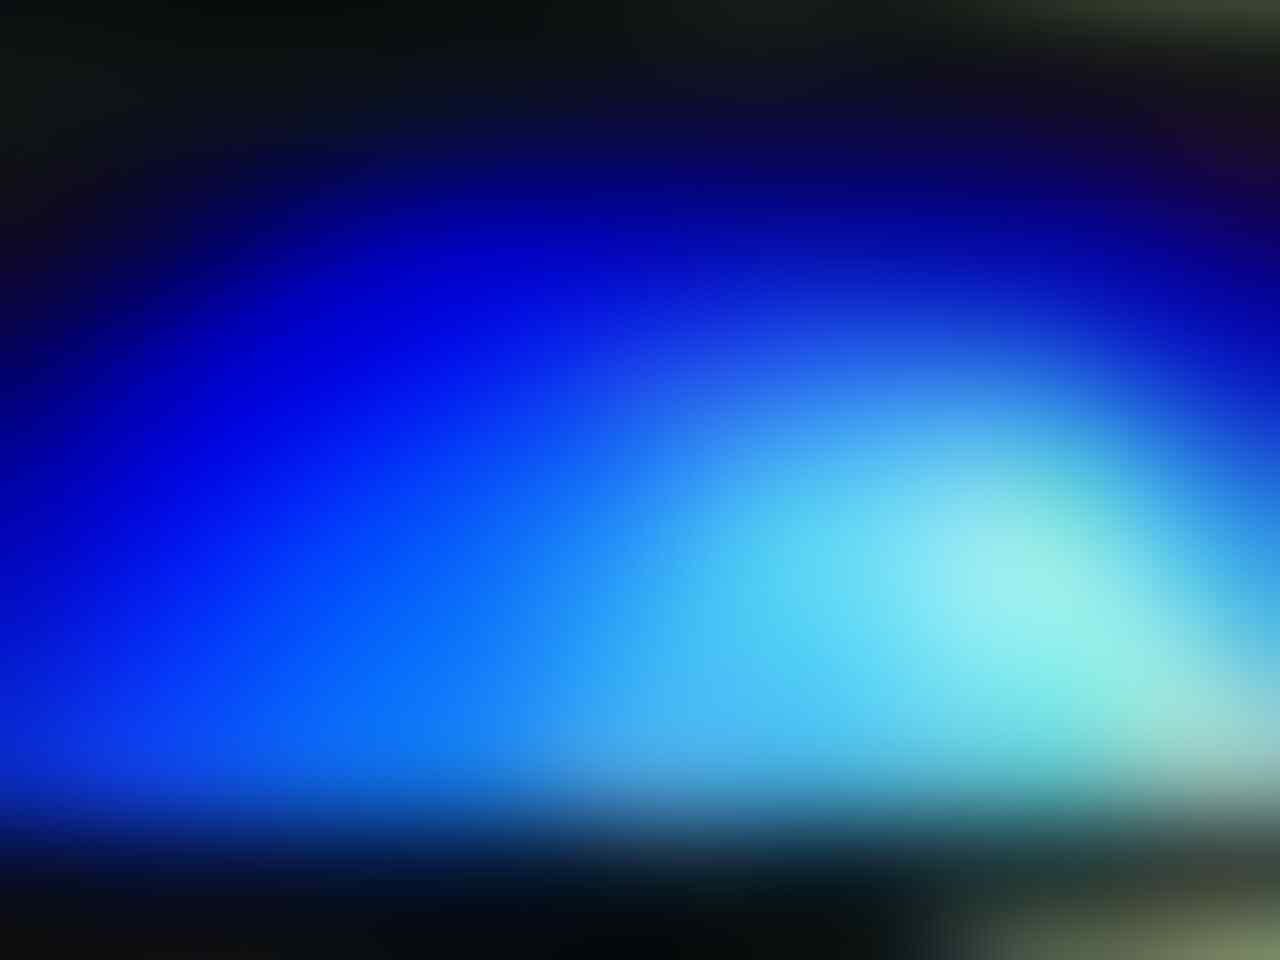 [Help] Repair Start up Windows 7